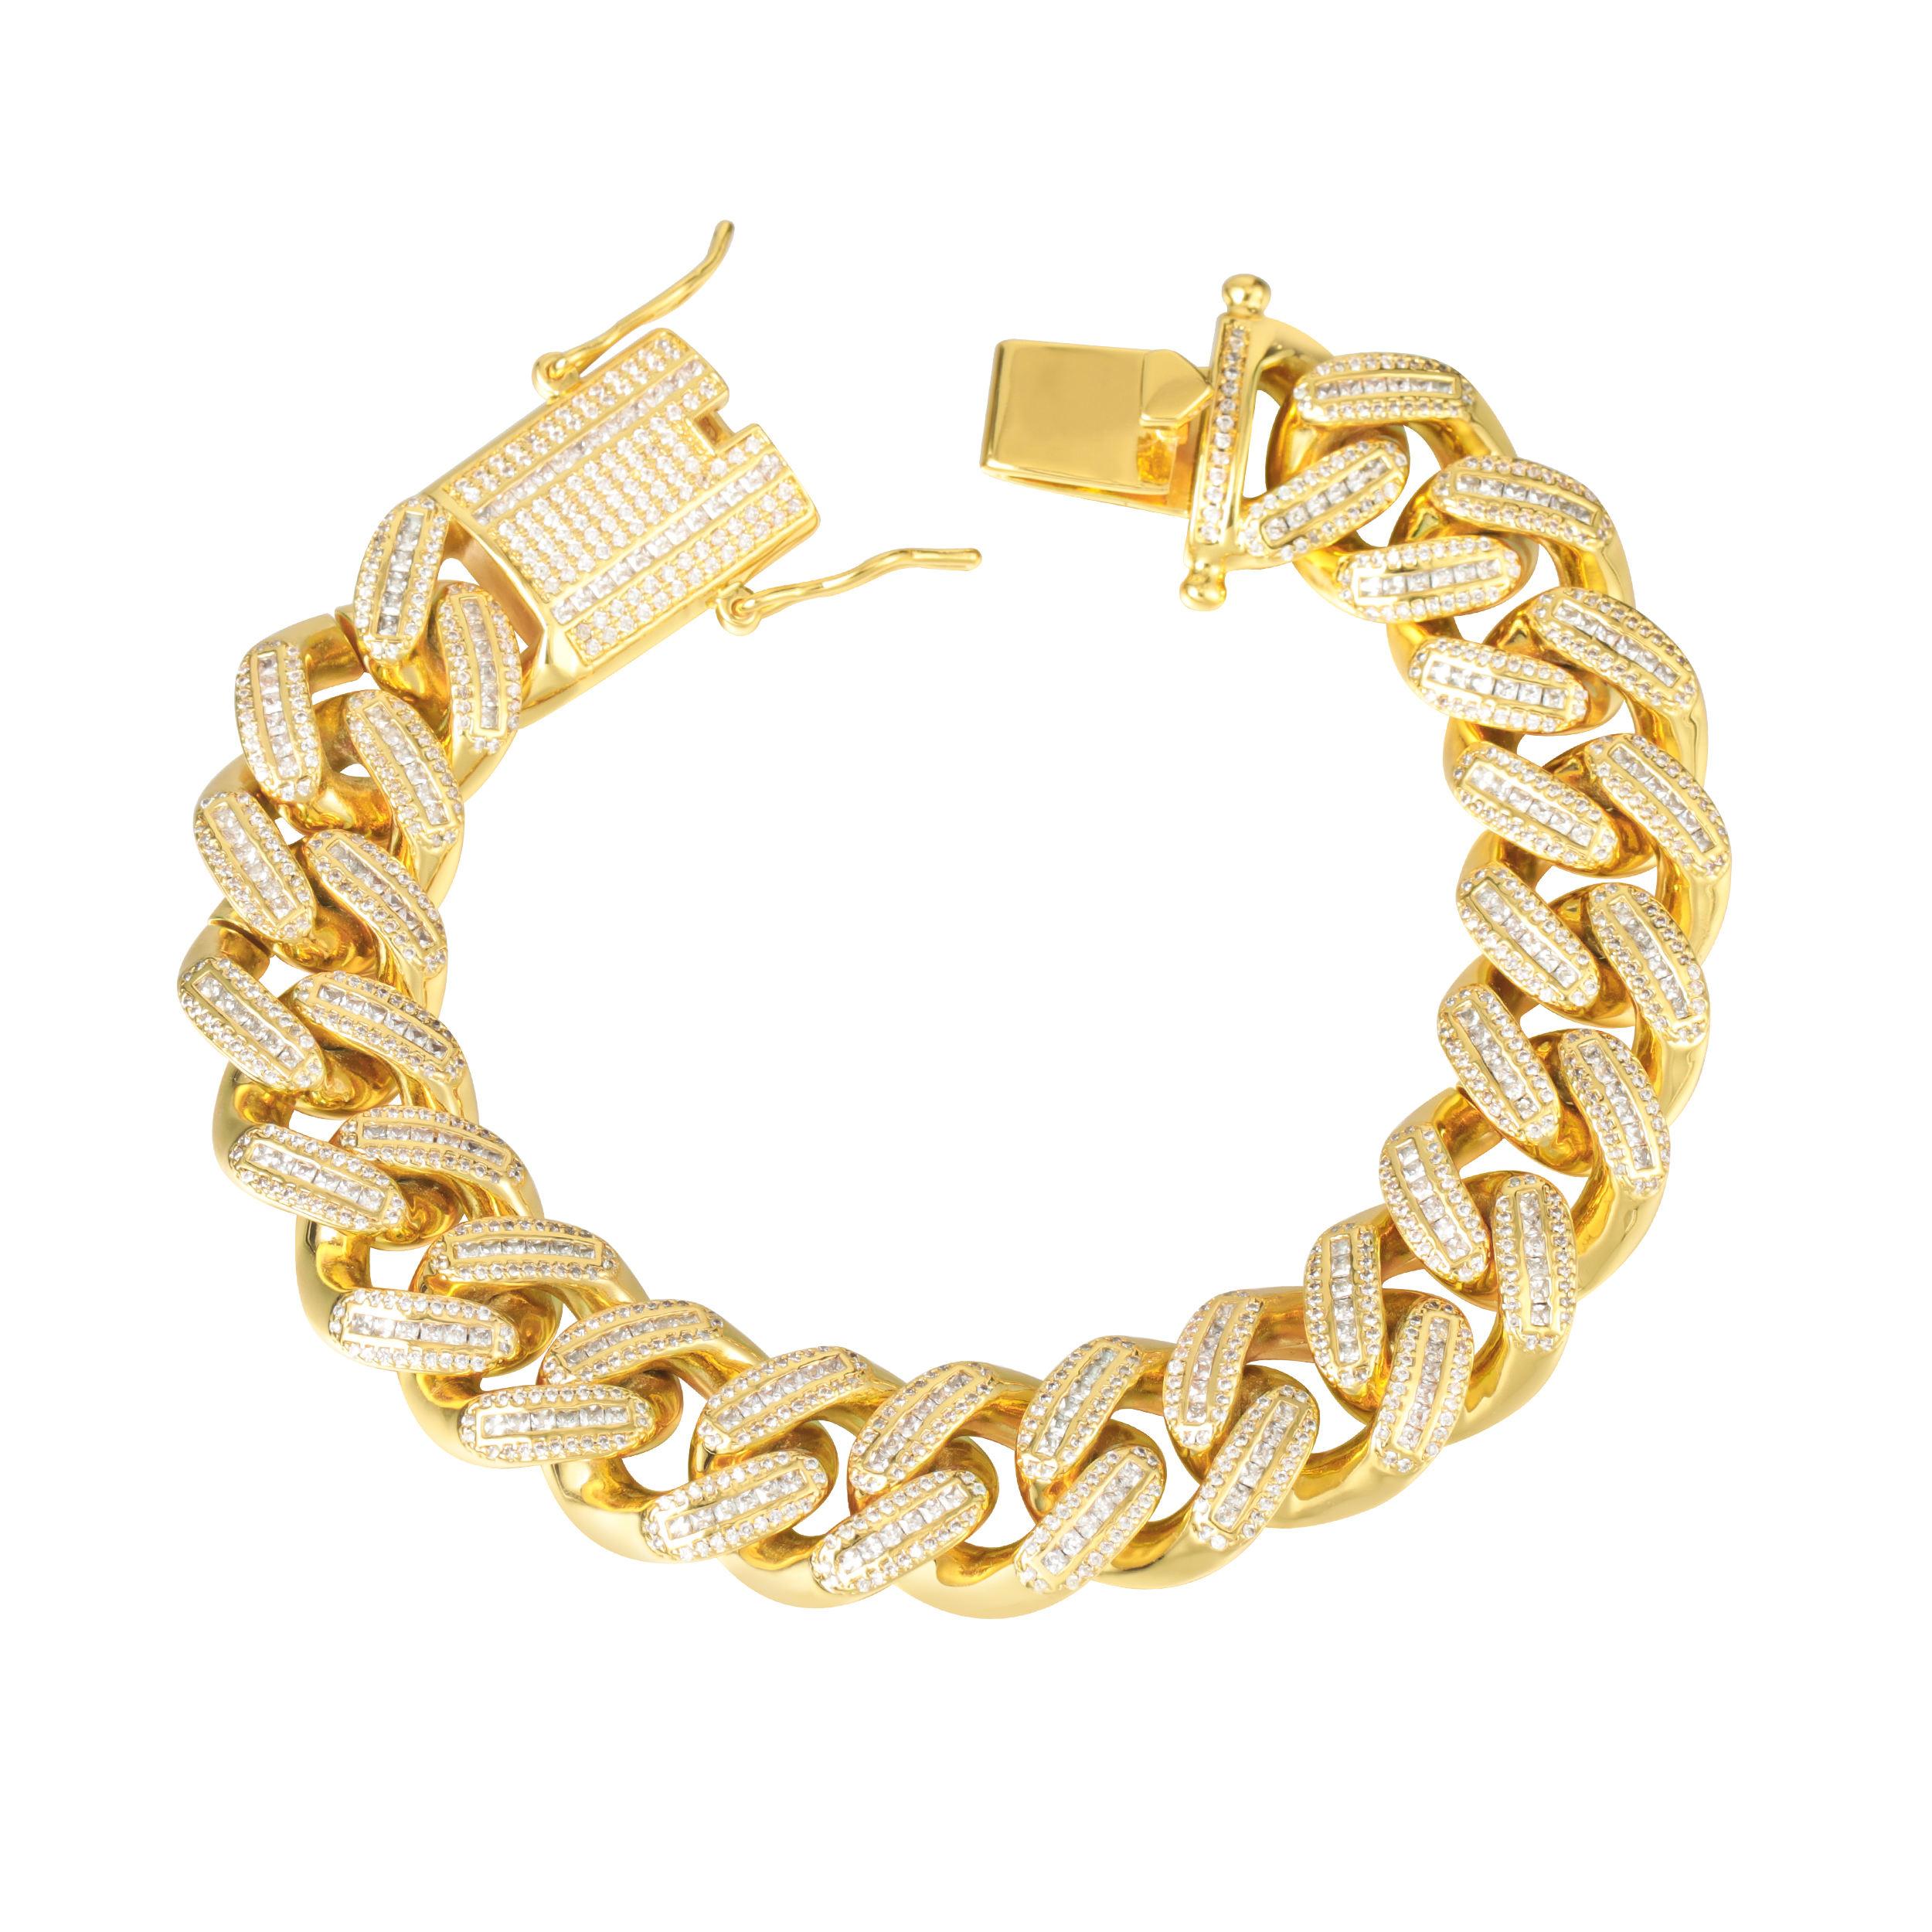 18kgp Necklace Price